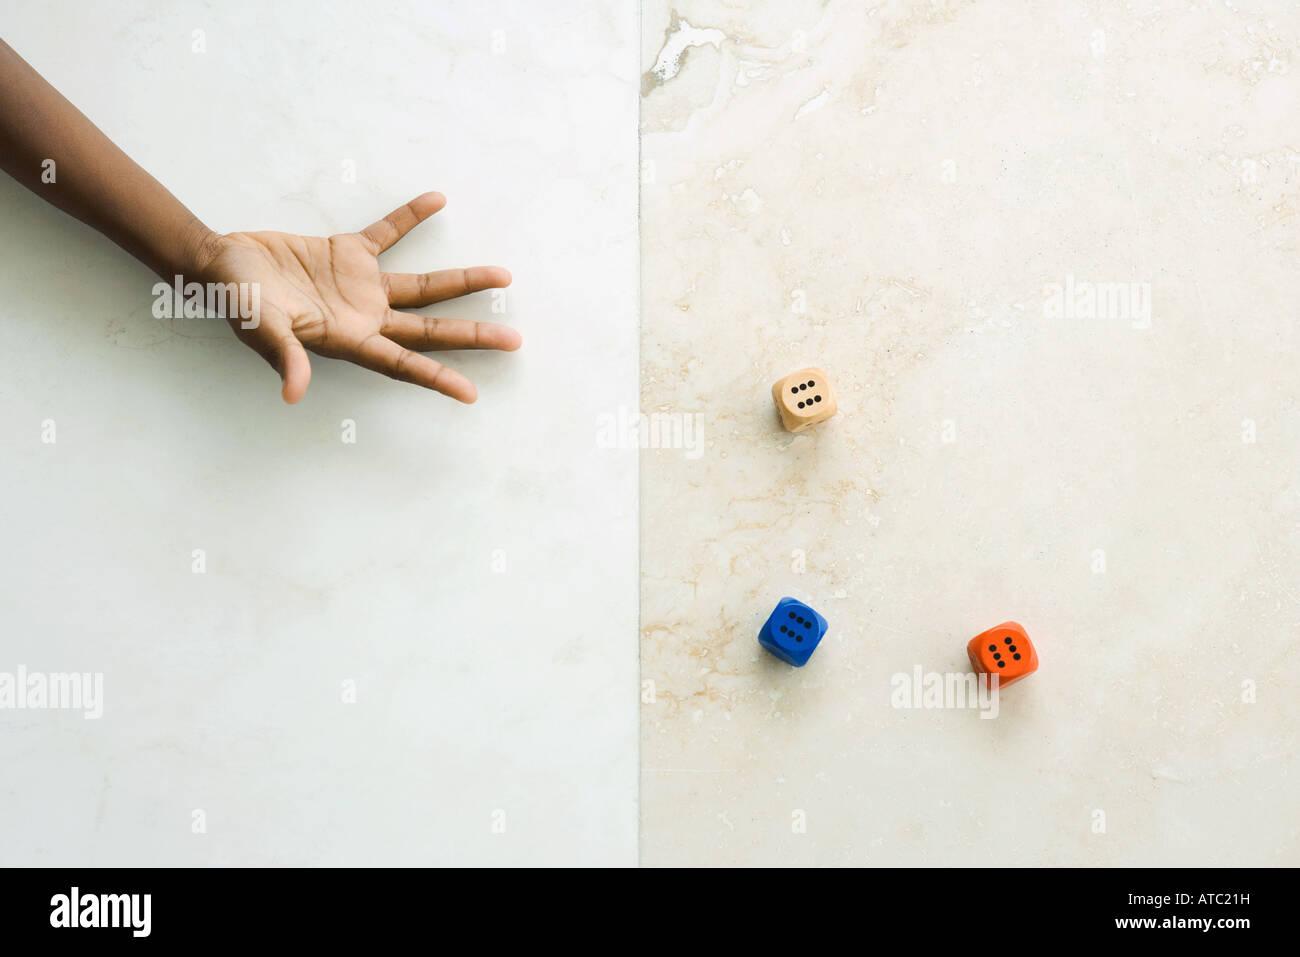 Würfeln, Kind beschnitten Blick auf hand Stockbild